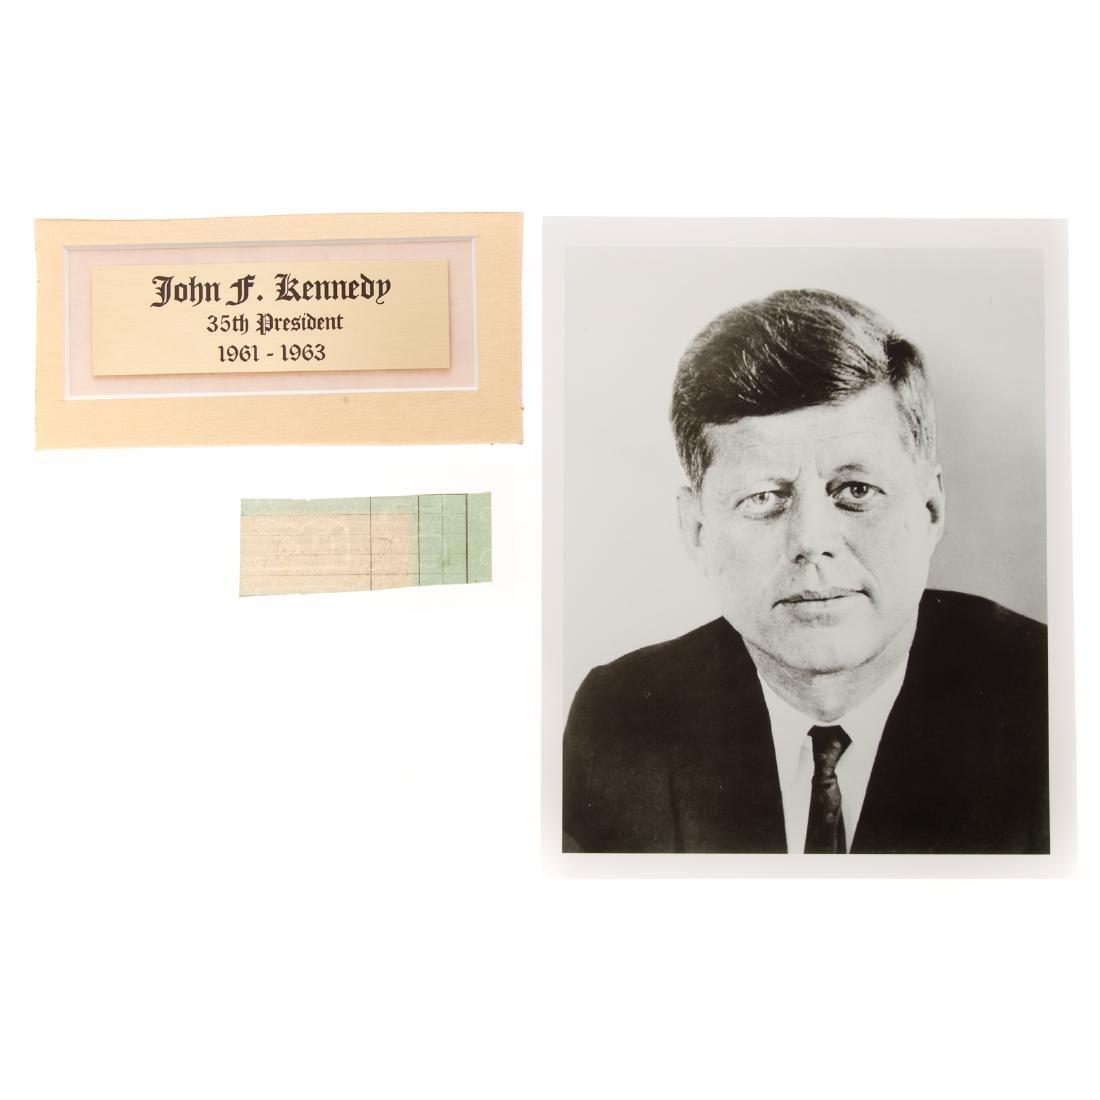 John F. Kennedy signature